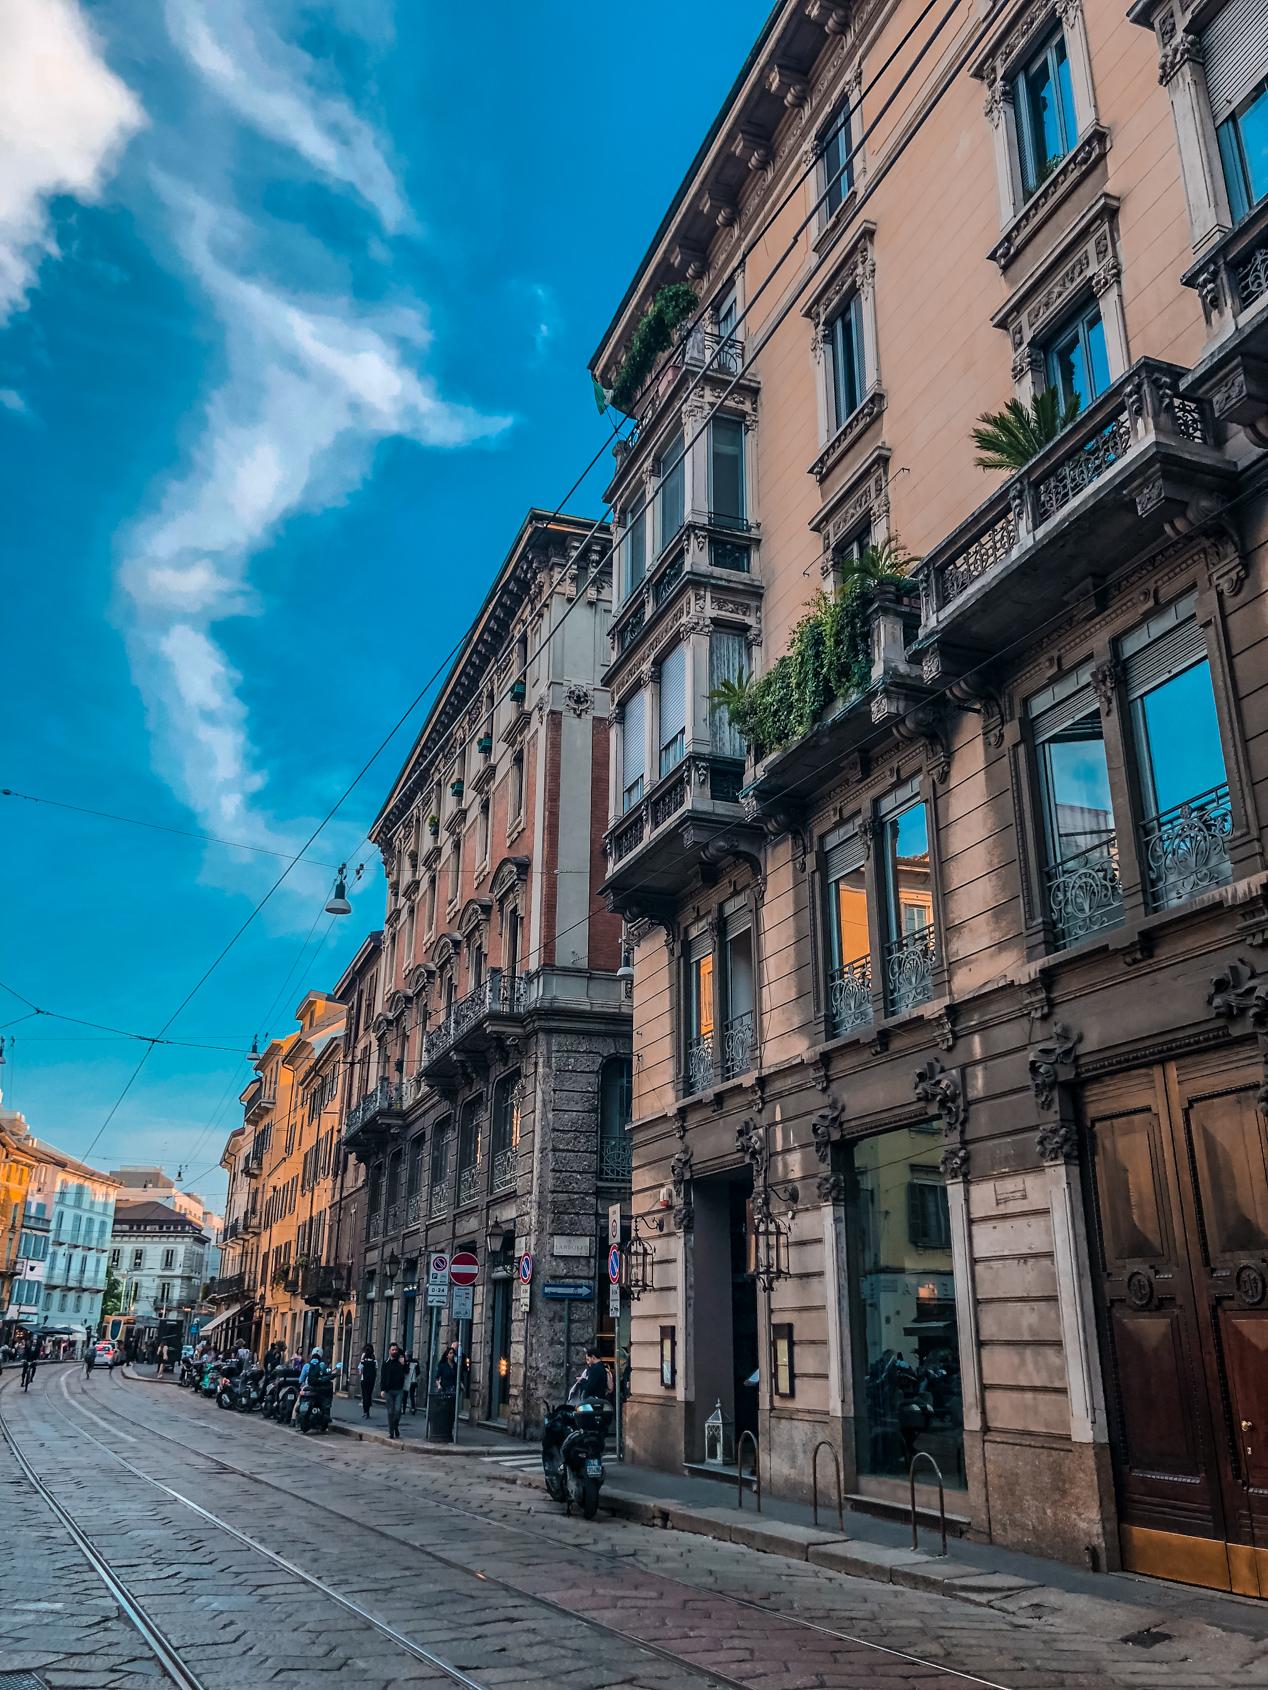 Traveldiary Milano, Reisebericht Mailand, Milan Travel, Reiseblogger, Tipps Mailand, Reisen, Travel, Must Sees in Mailand, Insider Tipps, Italien